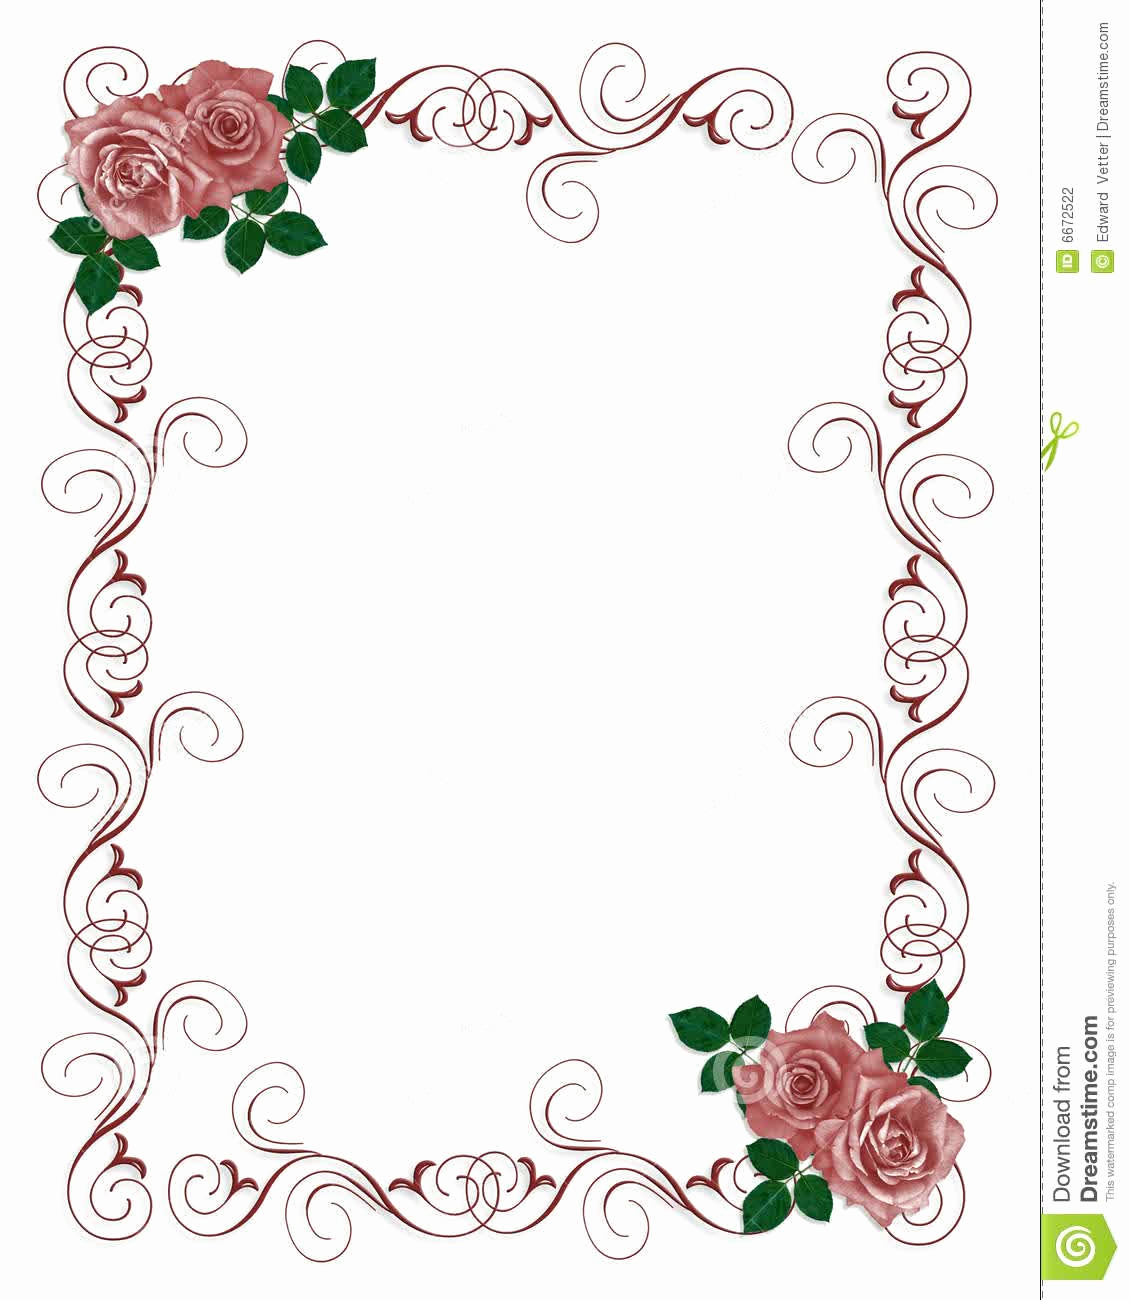 Free Wedding Invitation Templates Download Beautiful Floral Blank Wedding Invitation Templates